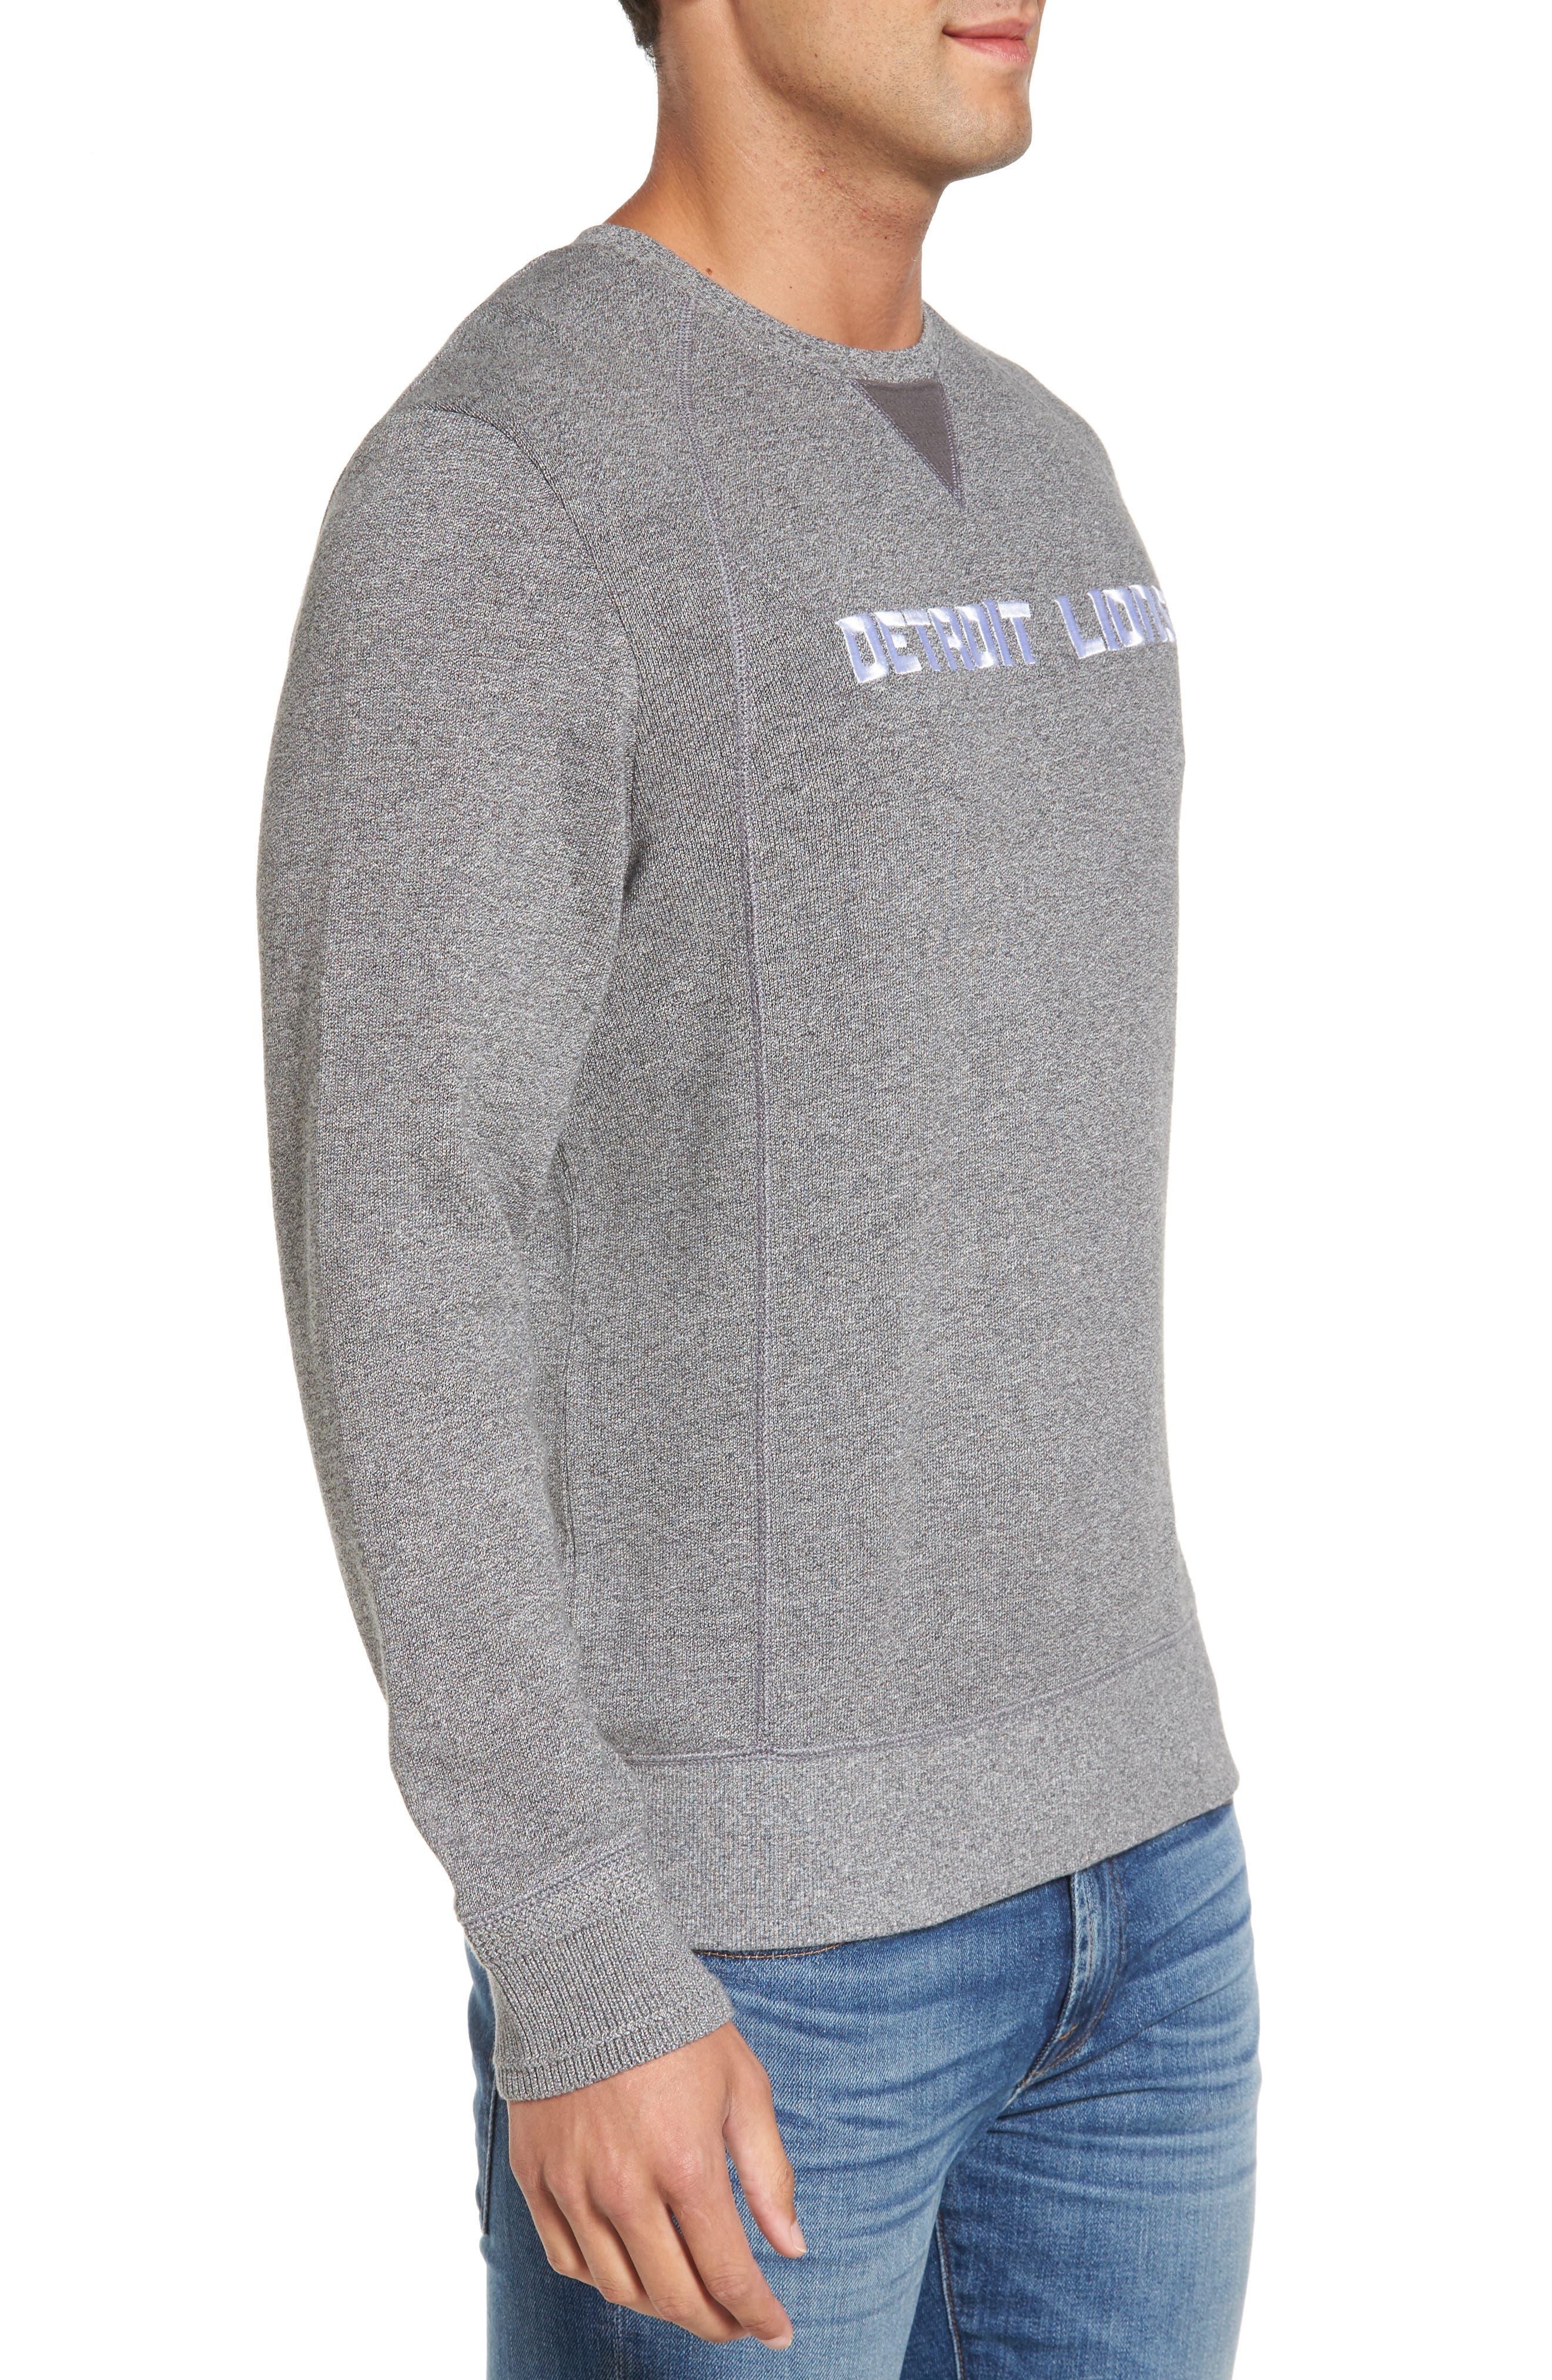 NFL Stitch of Liberty Embroidered Crewneck Sweatshirt,                             Alternate thumbnail 80, color,